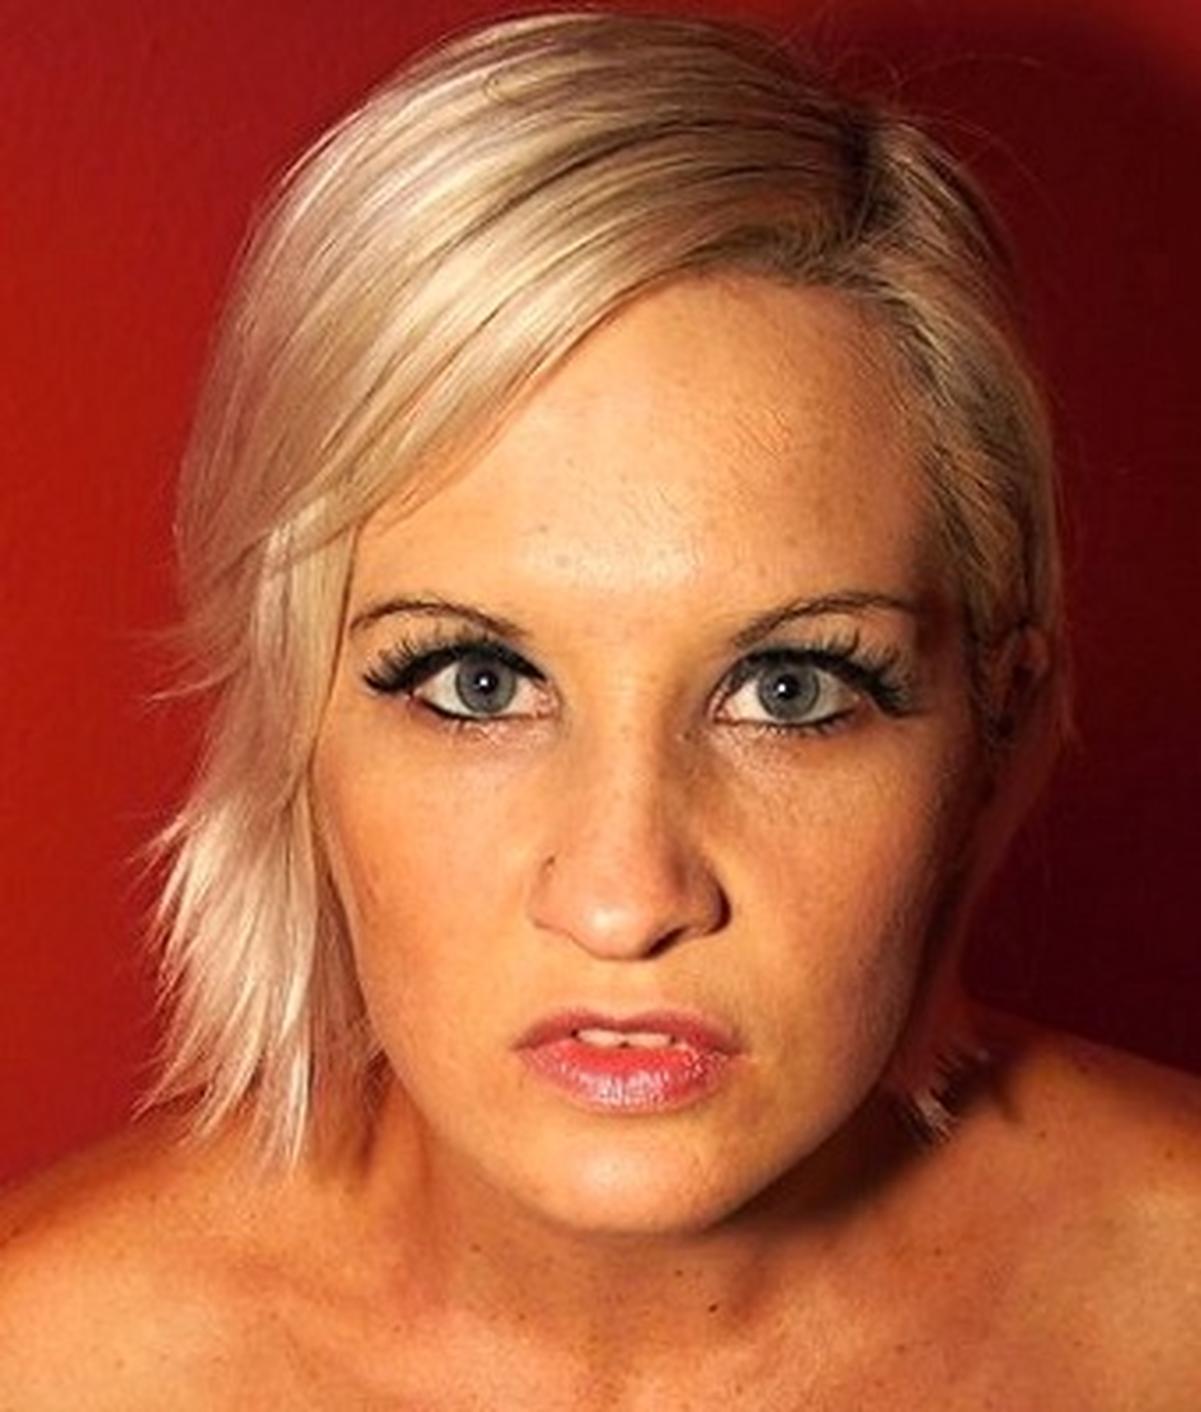 Heidi Hills Wiki & Bio - Pornographic Actress